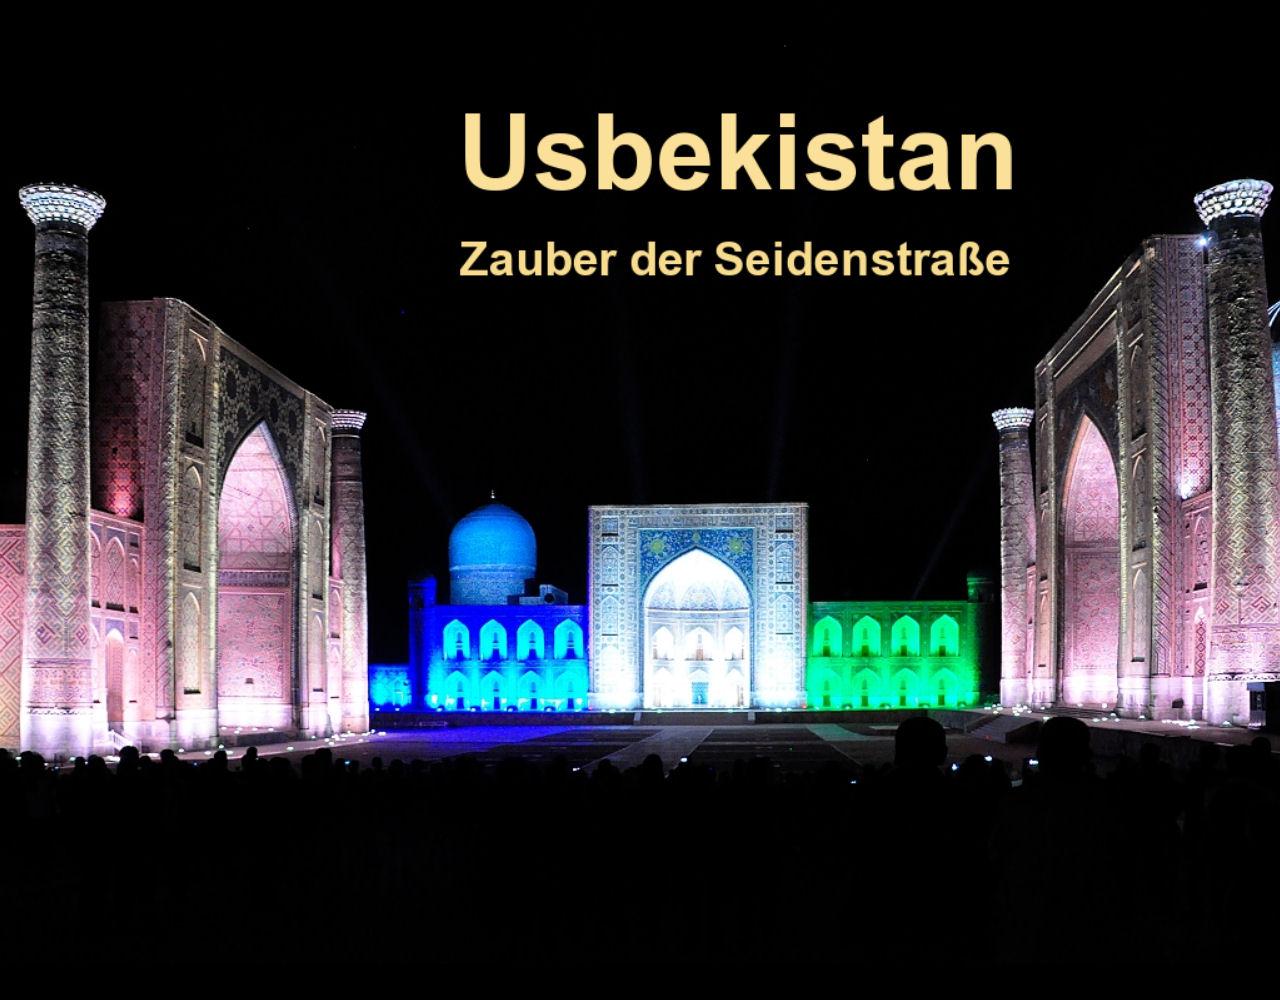 Multimediaschau Usbekistan